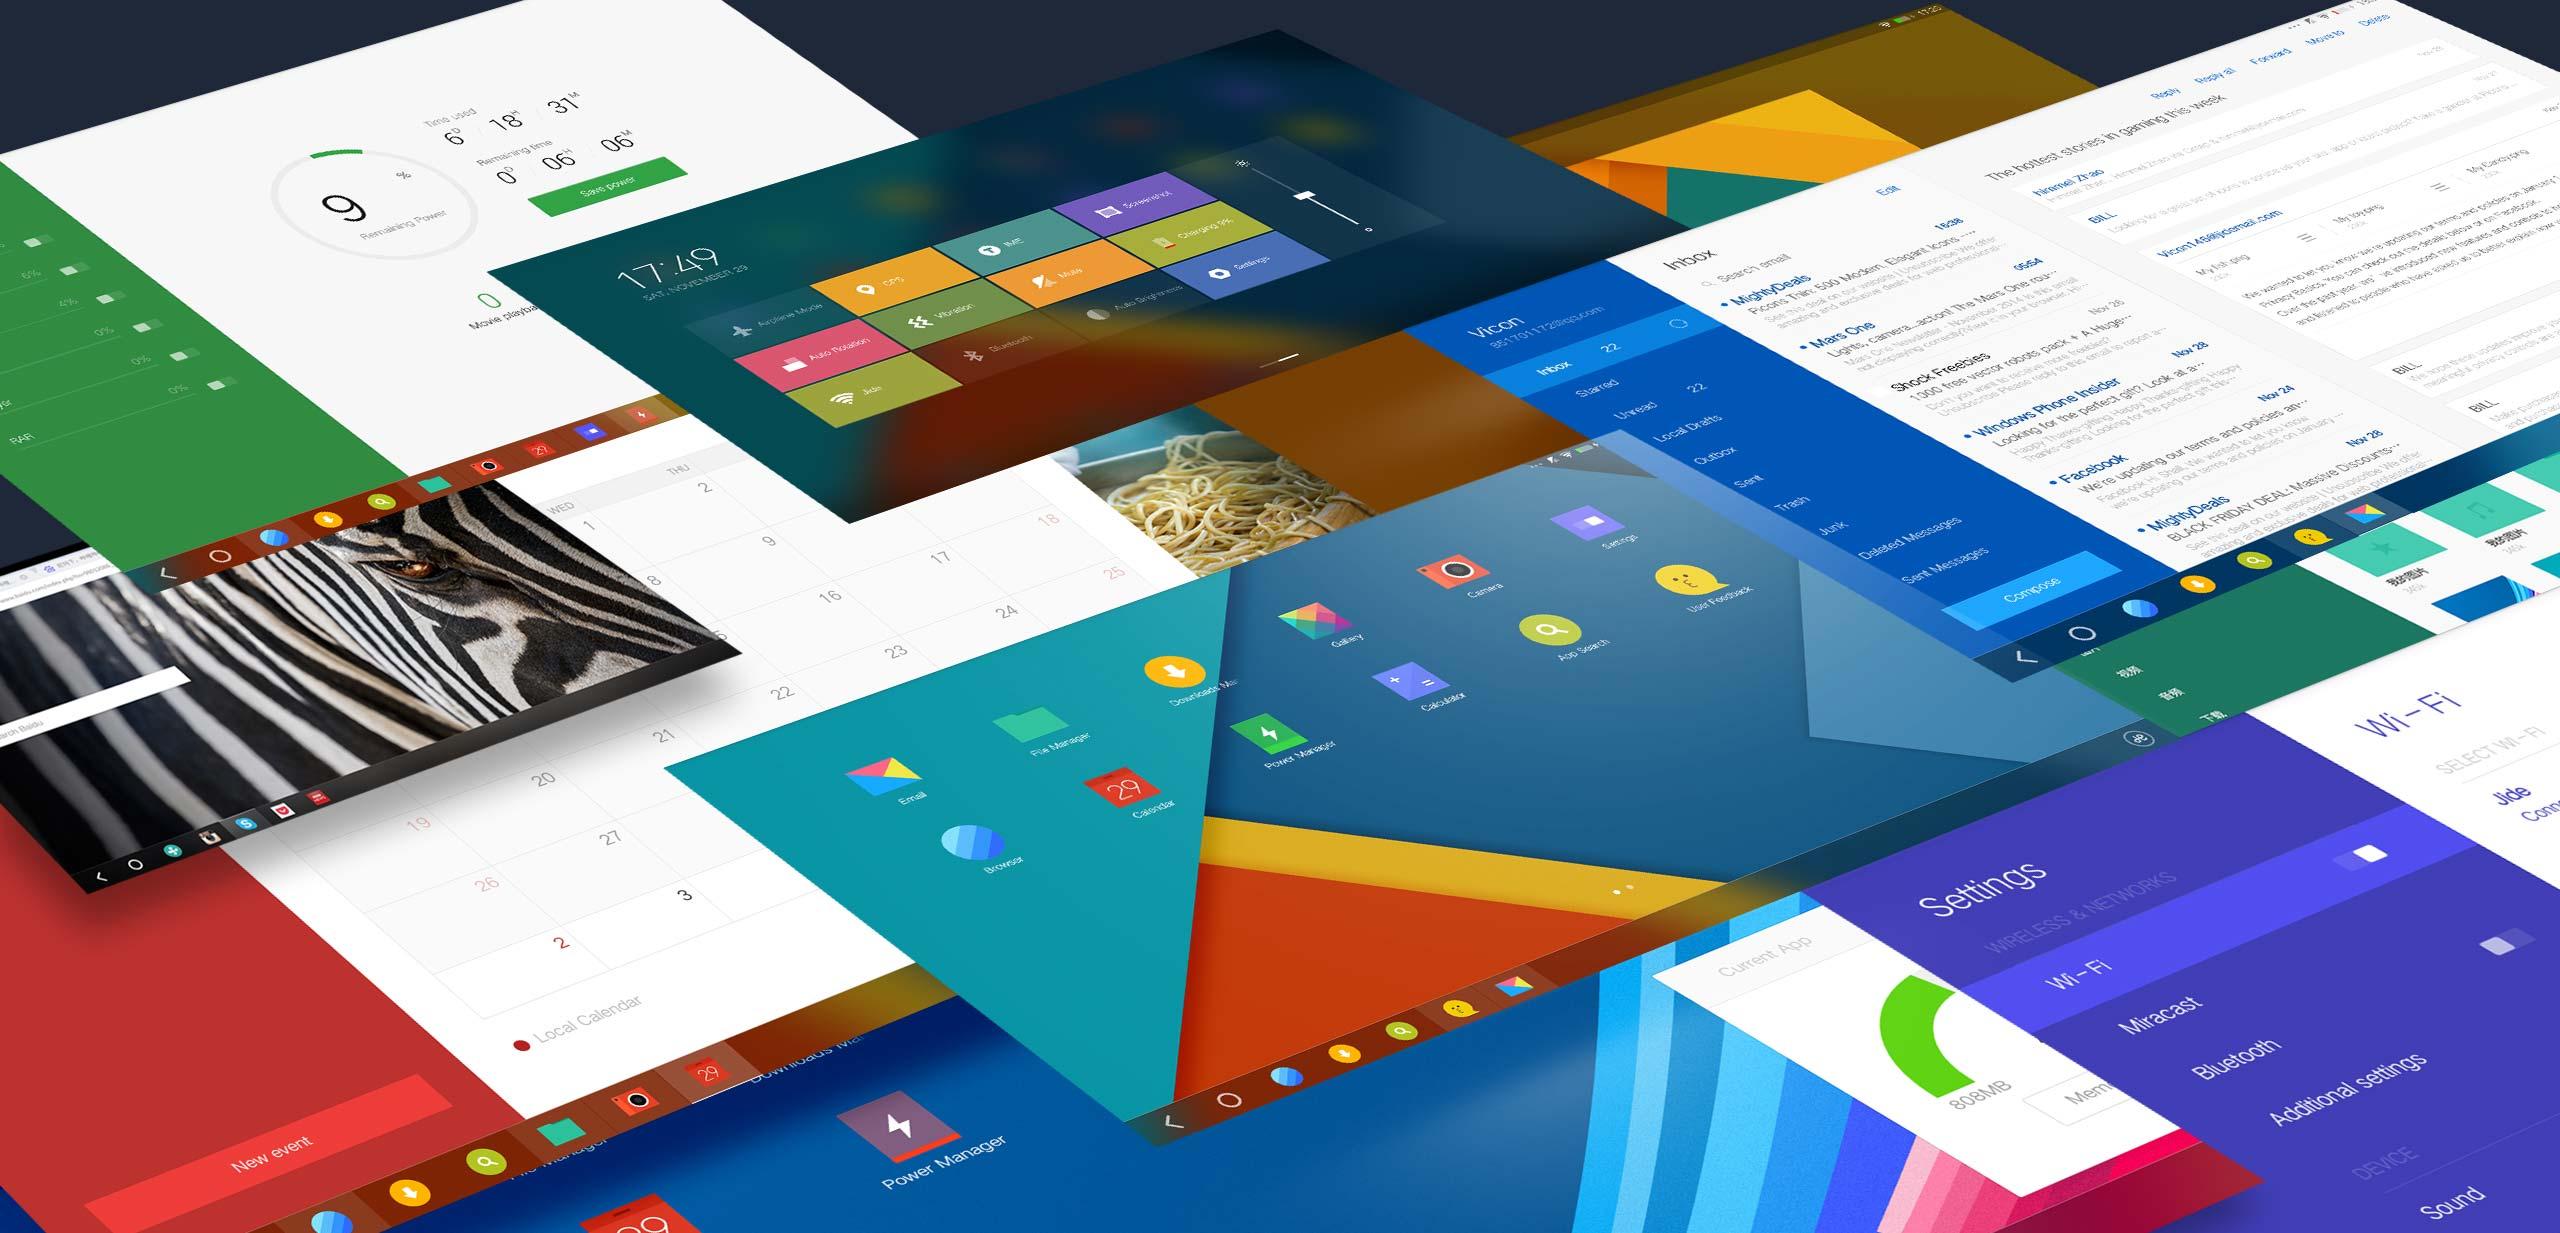 To koniec Remix OS. Android na komputerach właśnie poniósł klęskę